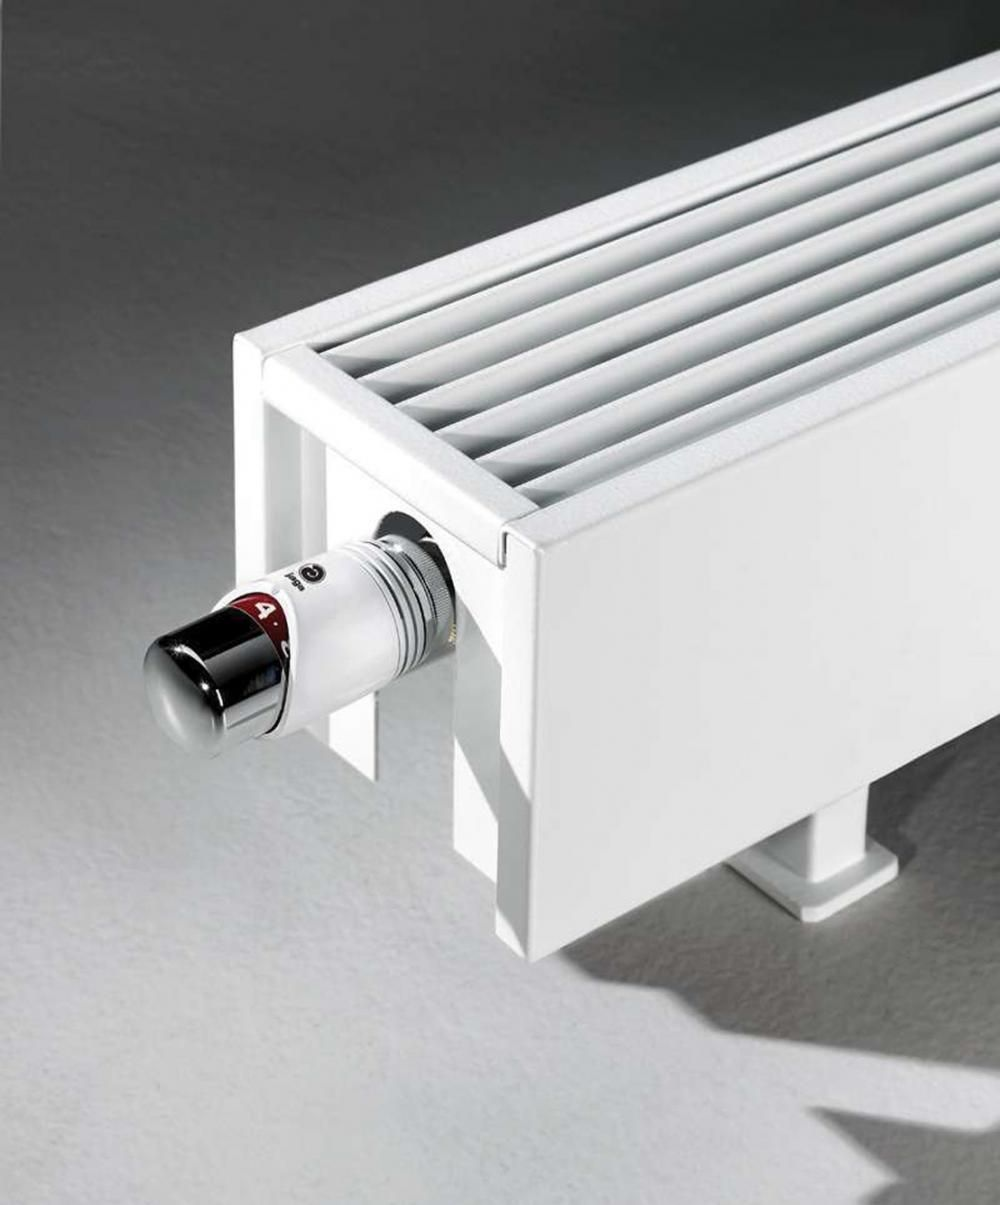 Calorifere Mini Freestanding 130x1200x80 mm, 395 W